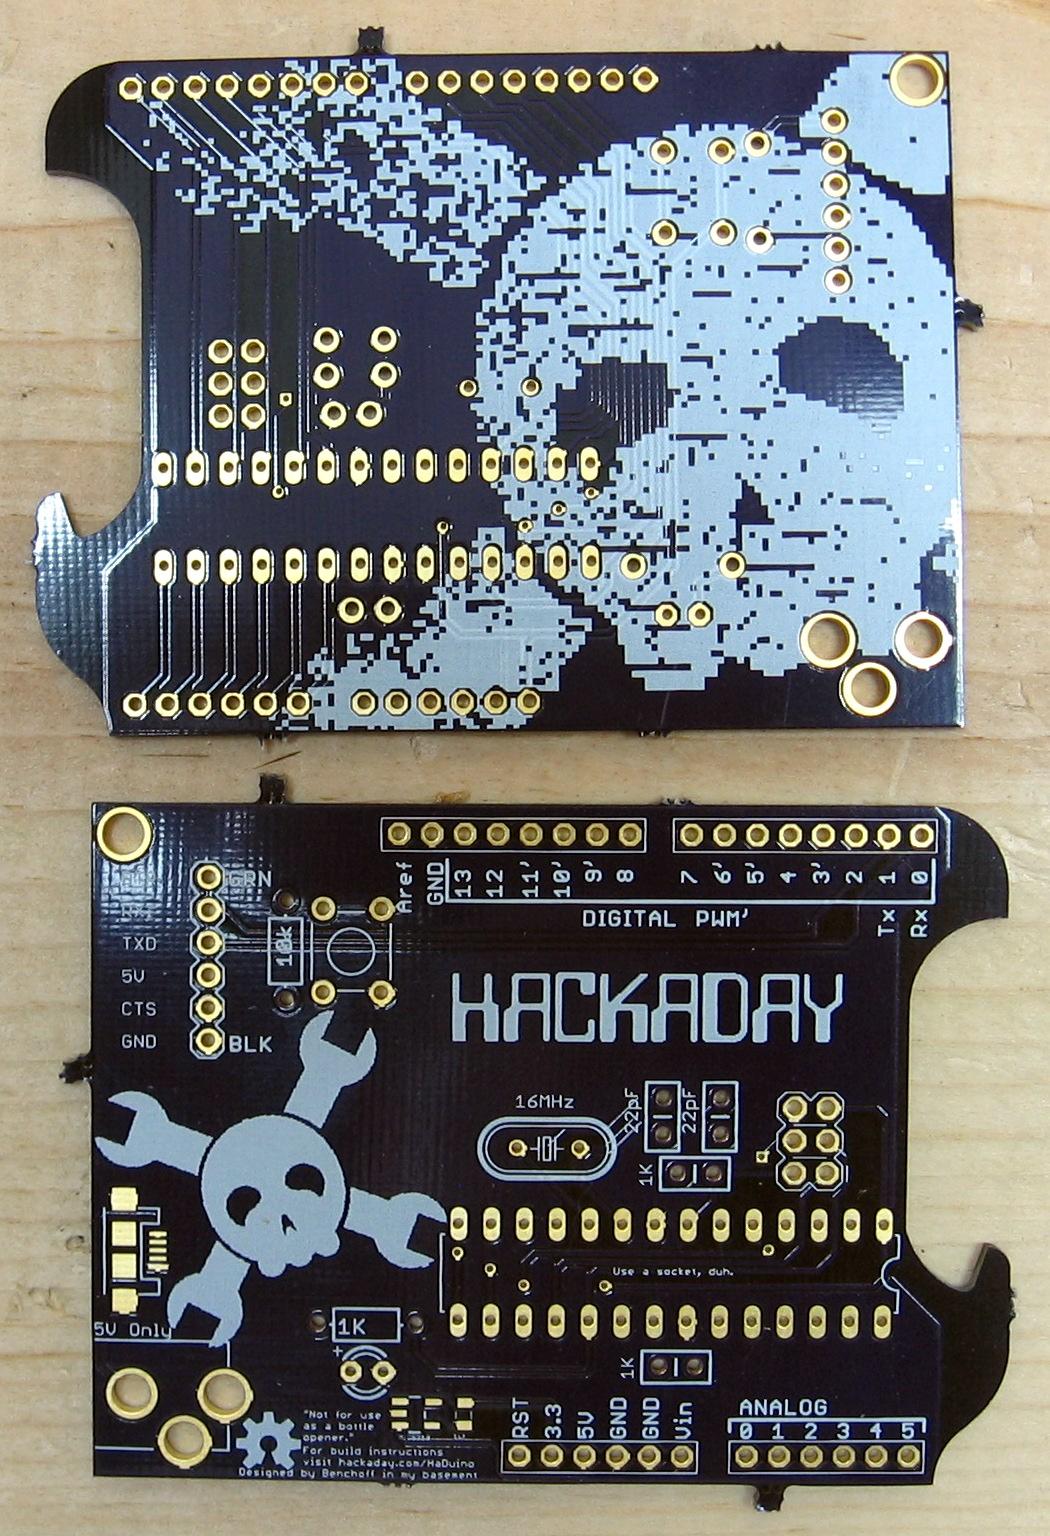 HaDuino: An Arduino That Opens Beer Bottles